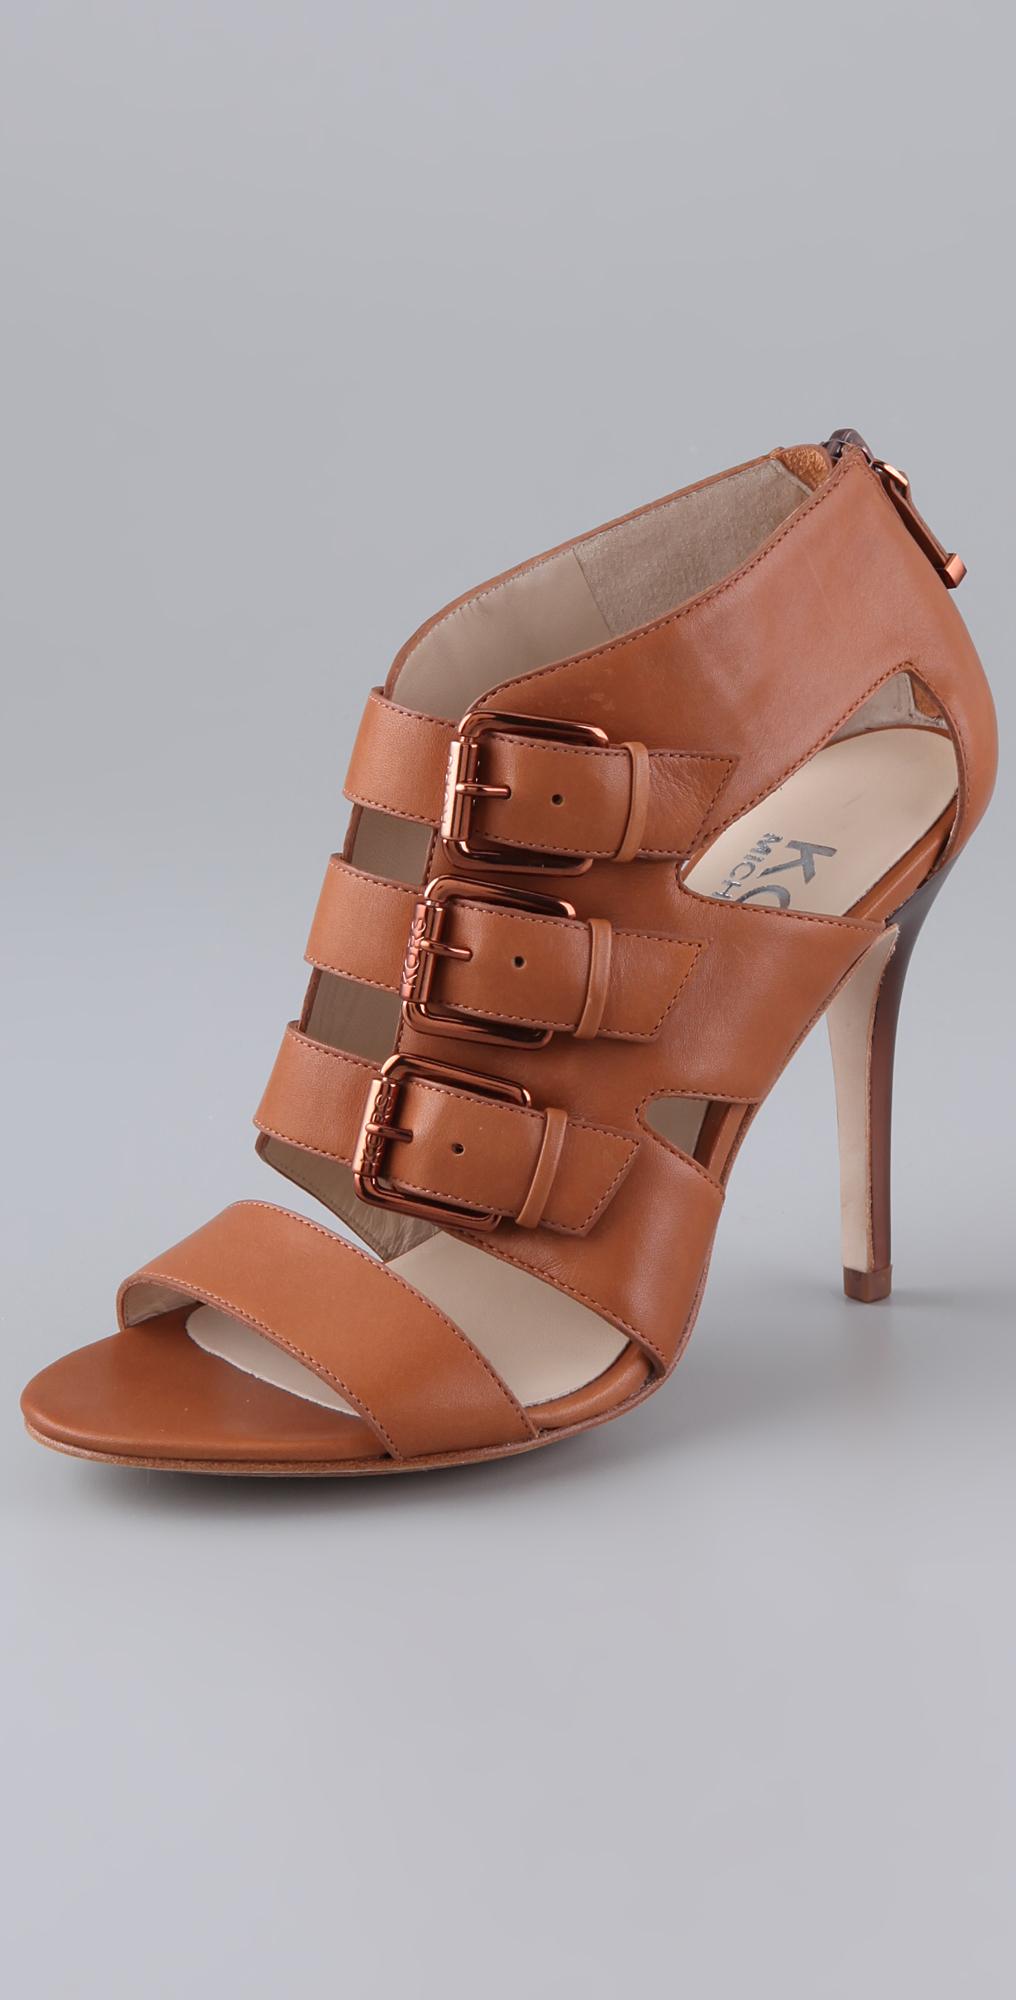 1be998ce068e7 KORS Michael Kors Sonoma High Heel Sandals